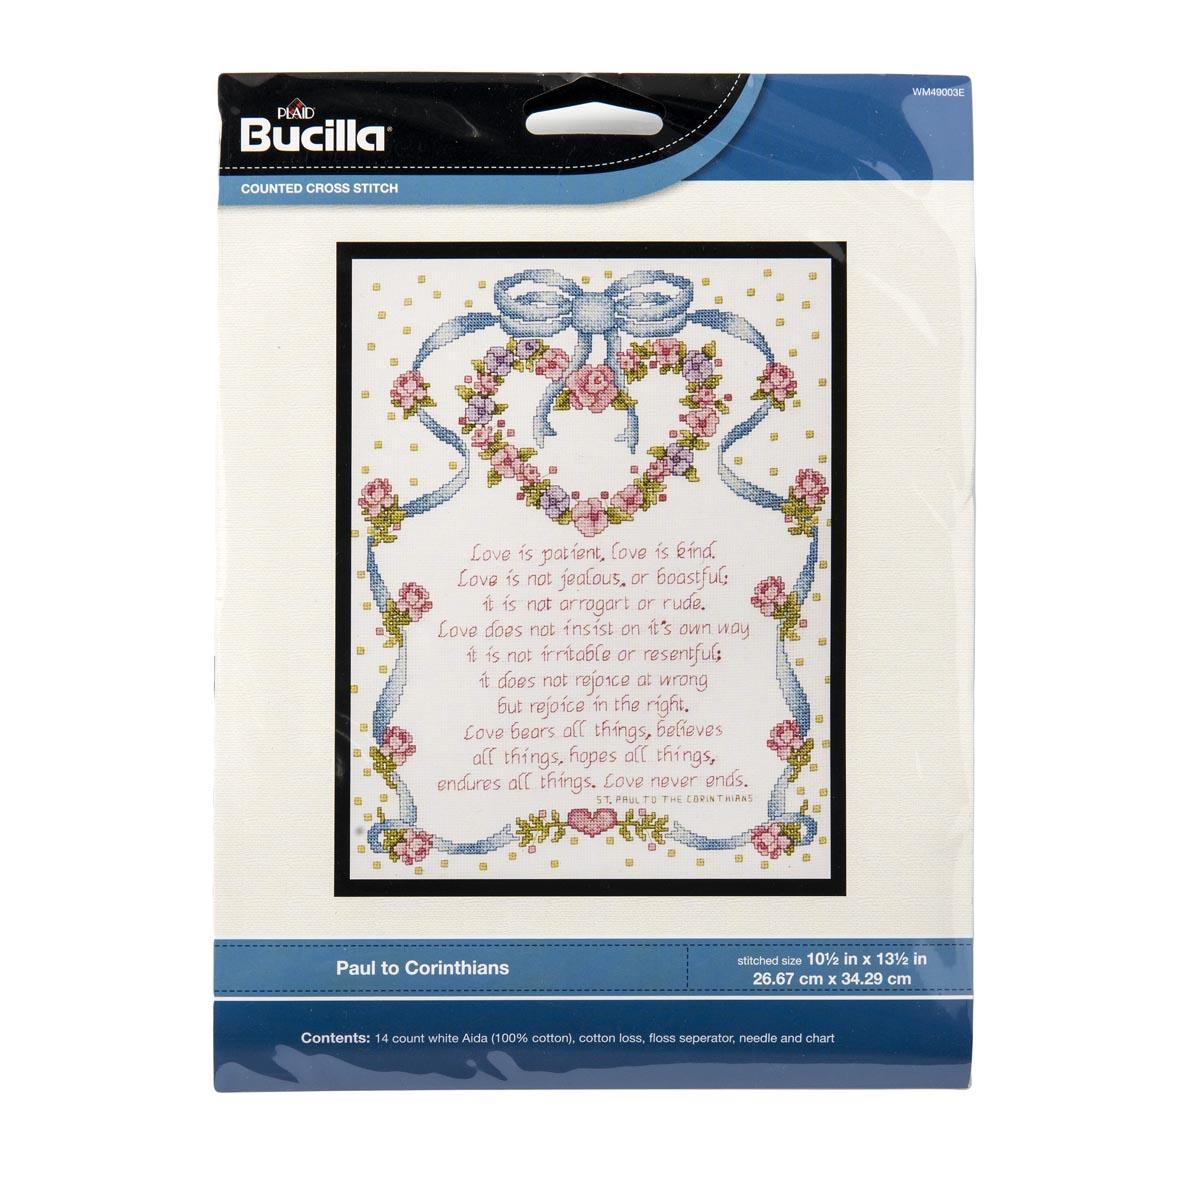 Bucilla ® Counted Cross Stitch - Picture Kits - Paul to Corinthians